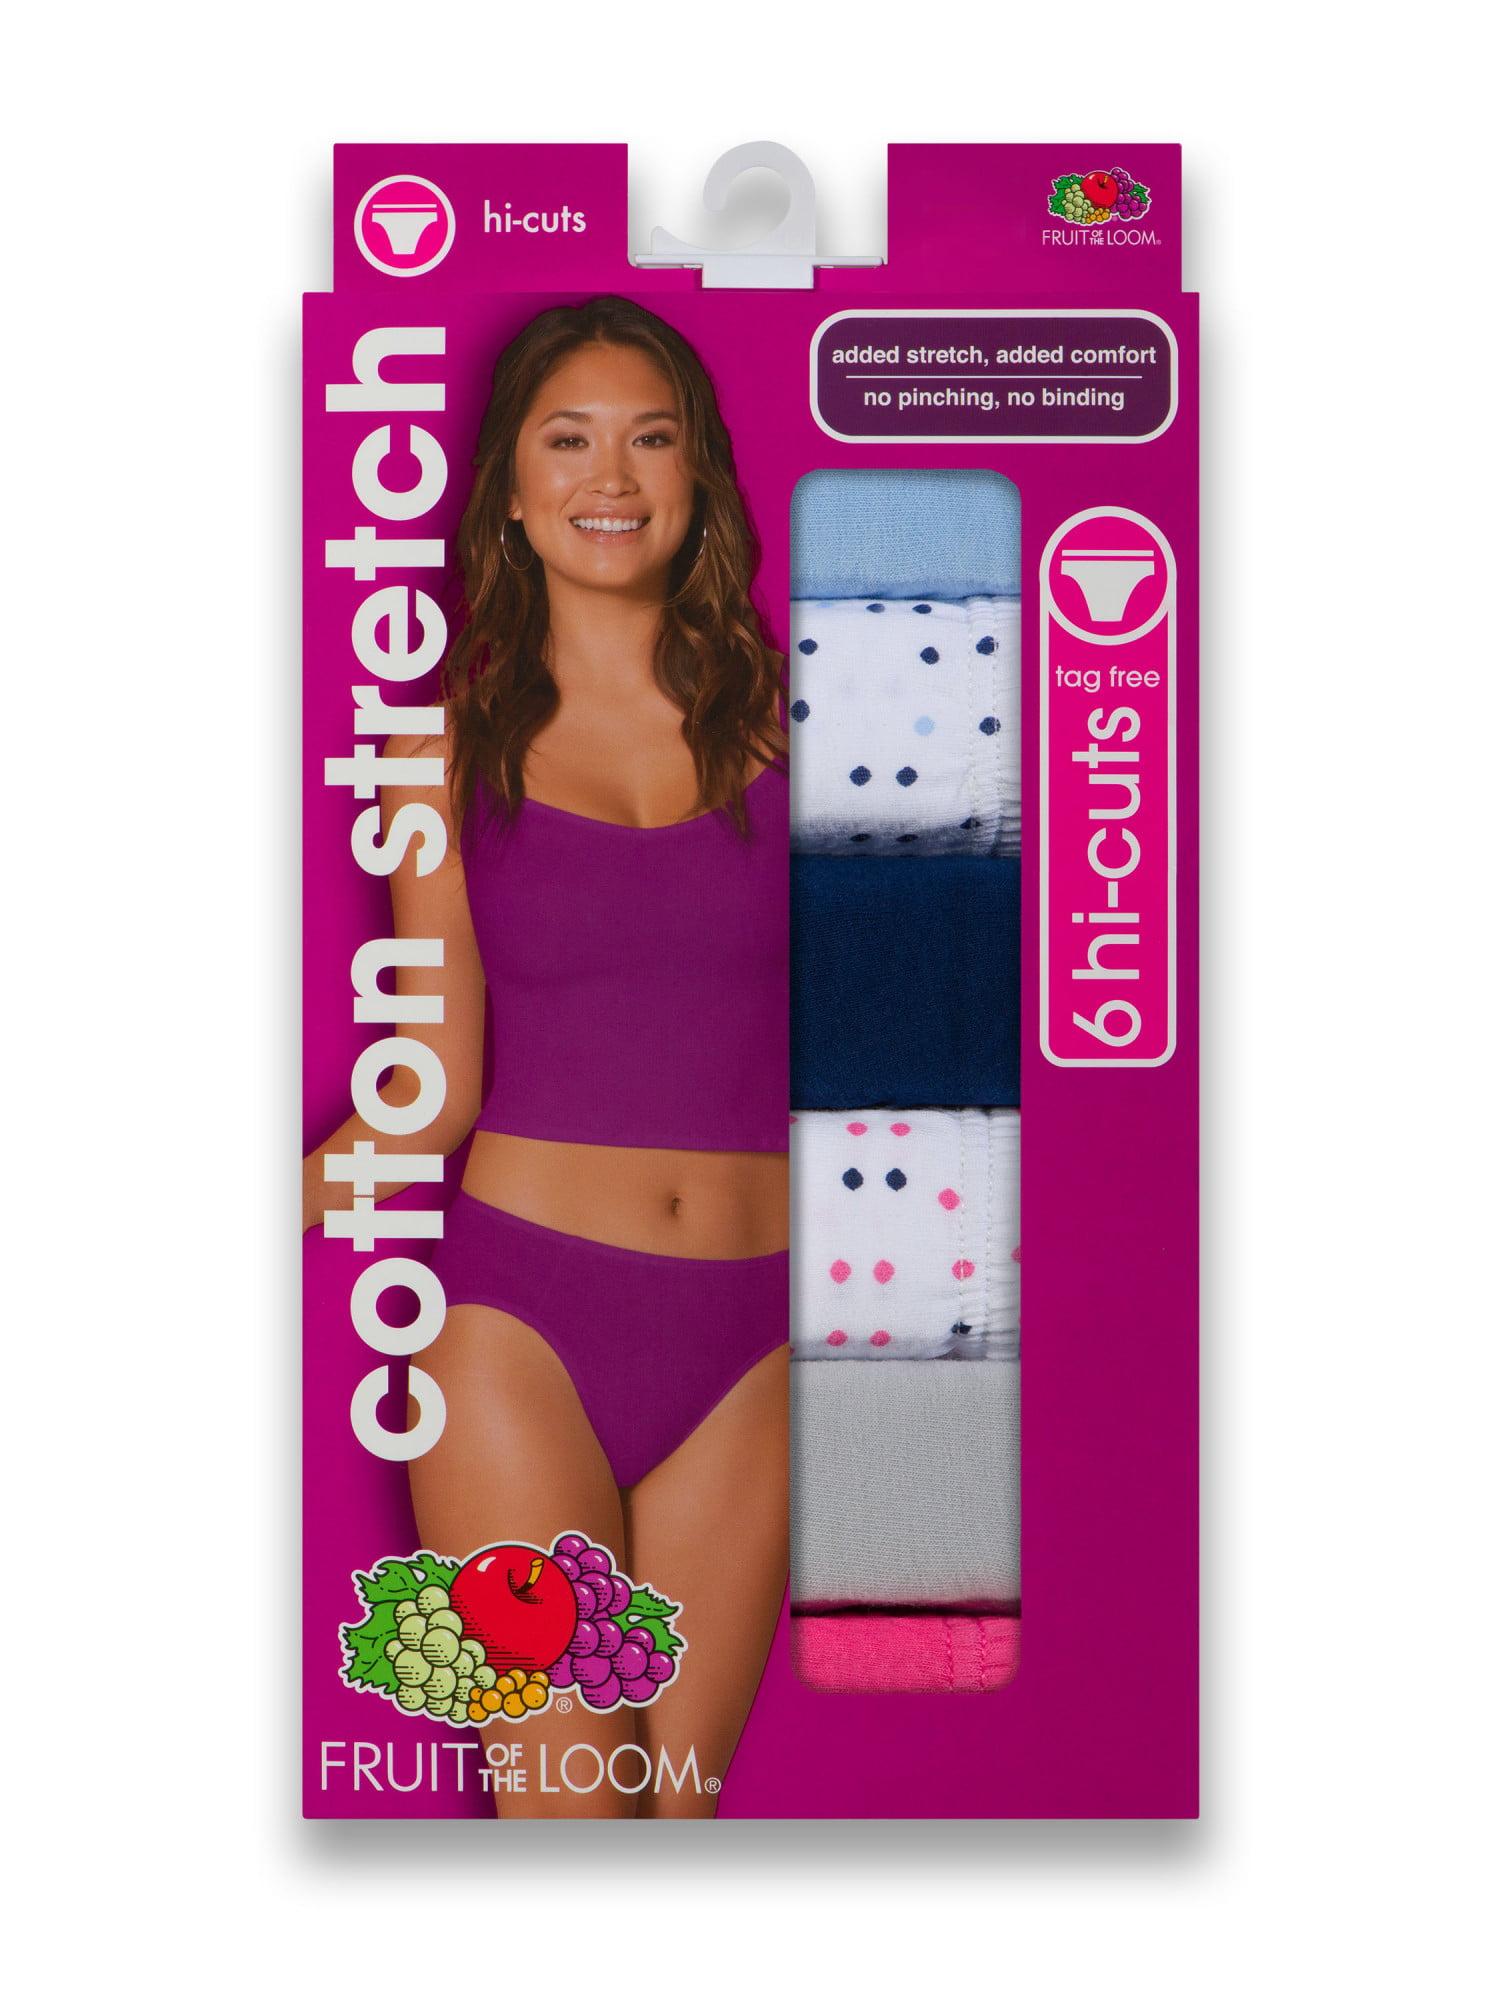 886f023d347a Fruit of the Loom - Women's Cotton Stretch Hi-Cut Panties, 6 Pack -  Walmart.com